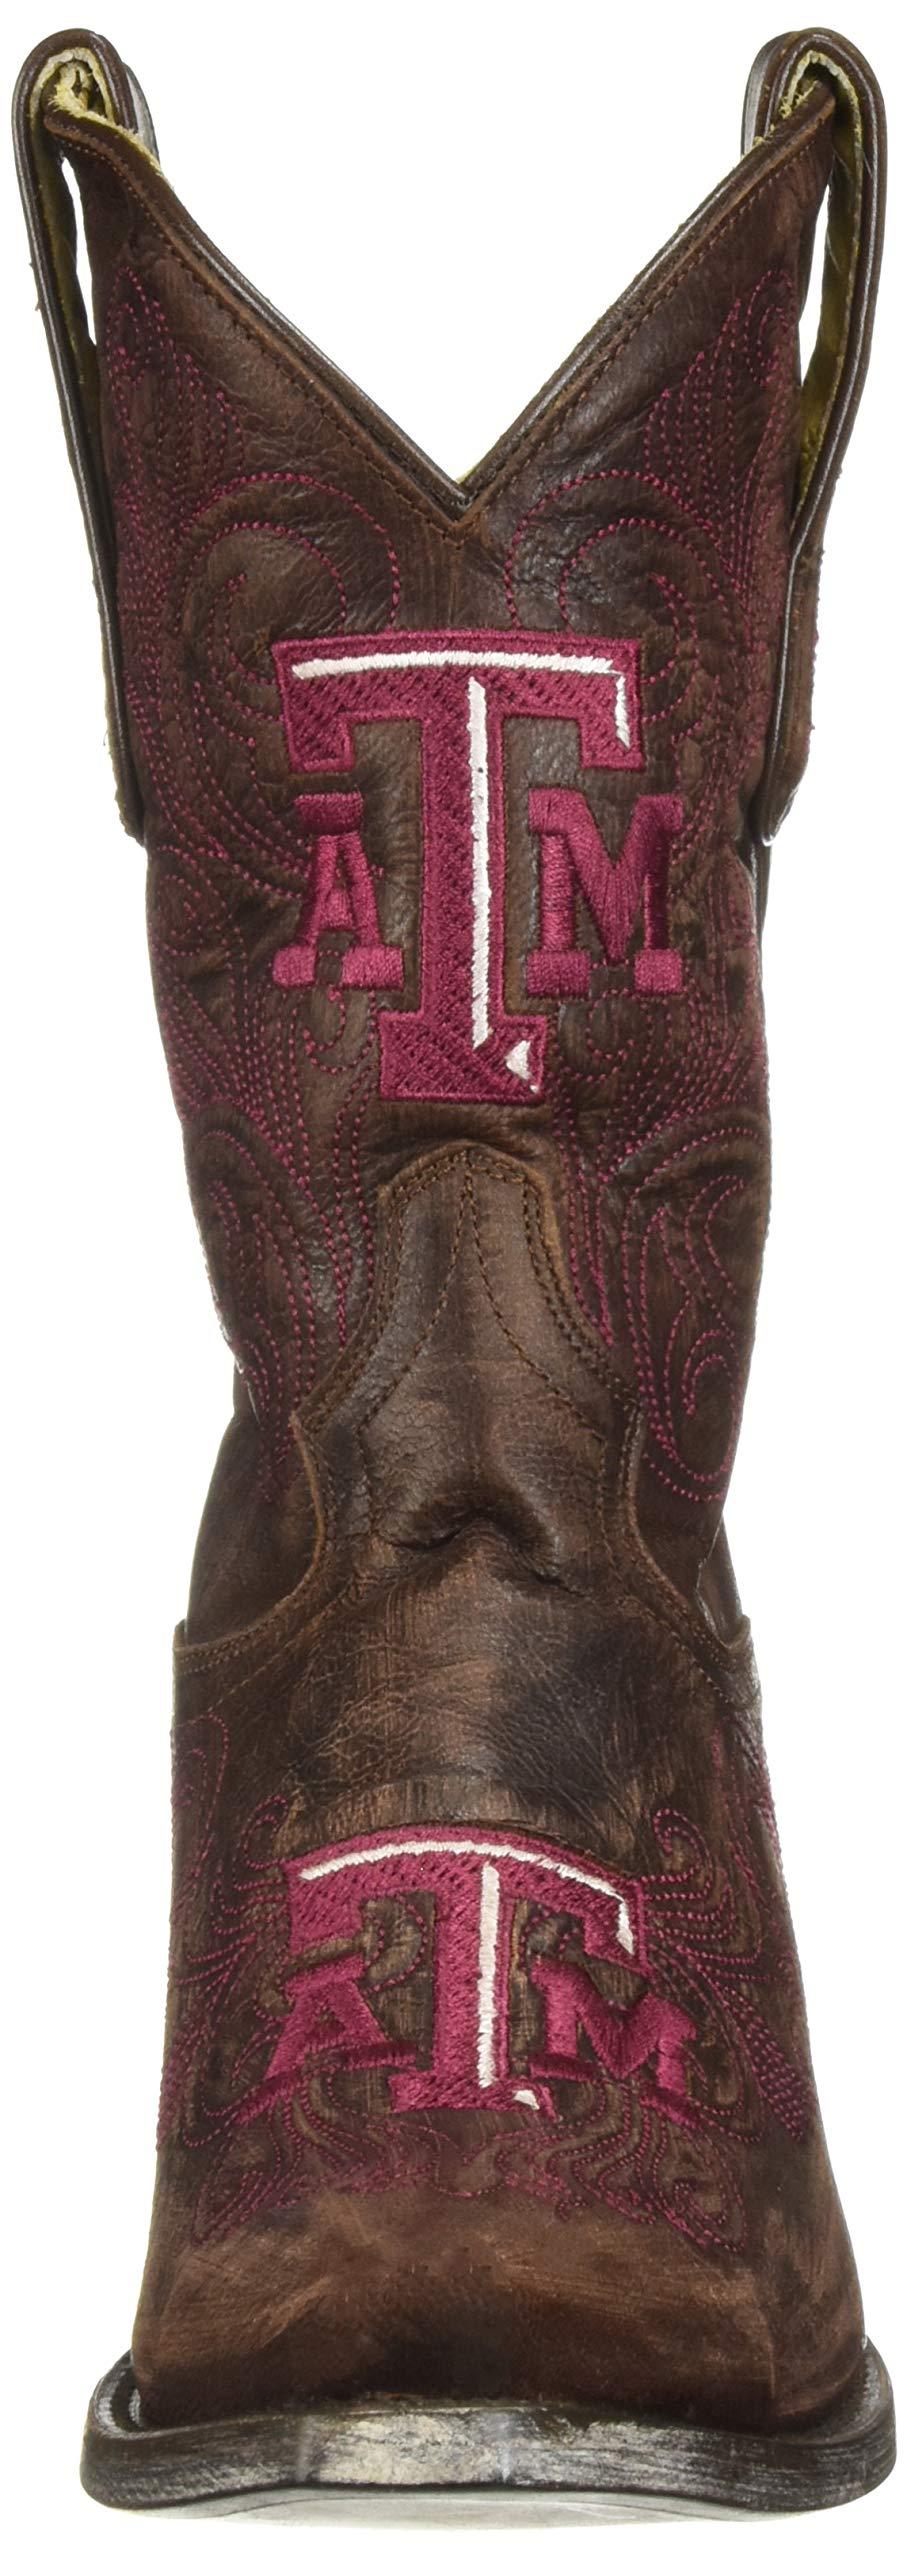 NCAA-Texas-A-amp-M-Aggies-Women-039-s-10-Inch-Gameday-Boot-Choose-SZ-color miniature 5